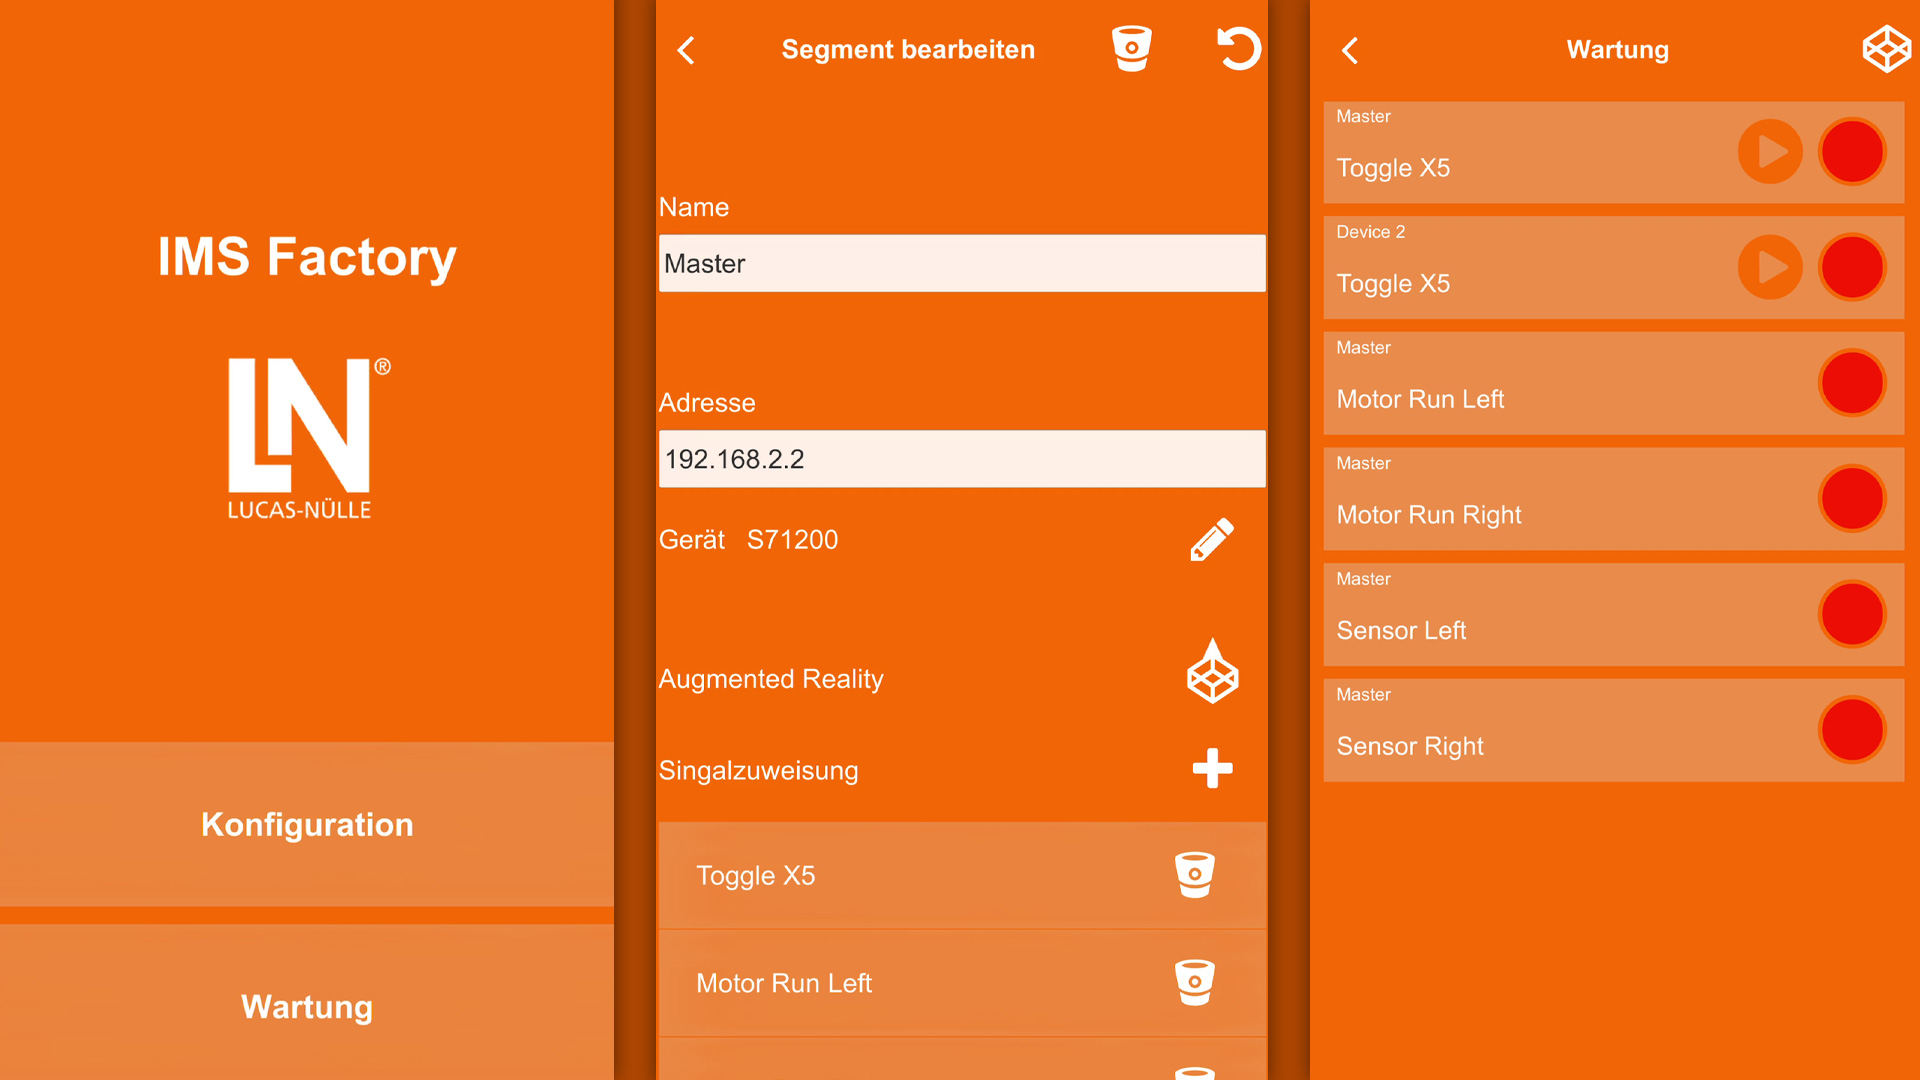 ims-factory-app-triboot-technologies-00